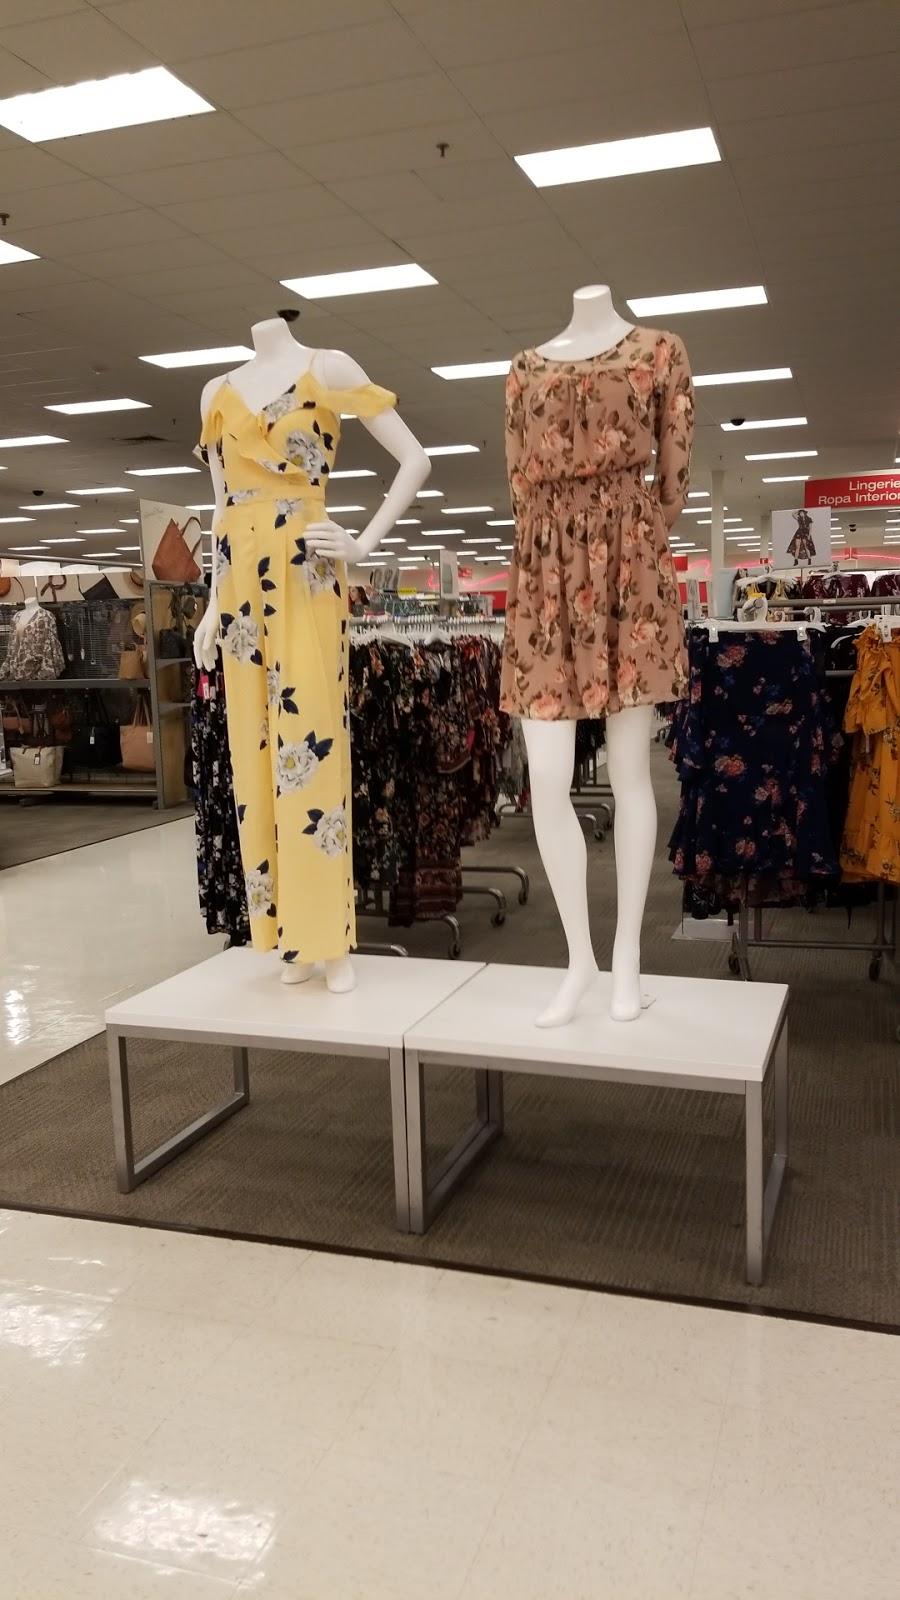 Target - department store    Photo 8 of 9   Address: 7501 San Dario Ave, Laredo, TX 78045, USA   Phone: (956) 722-6800